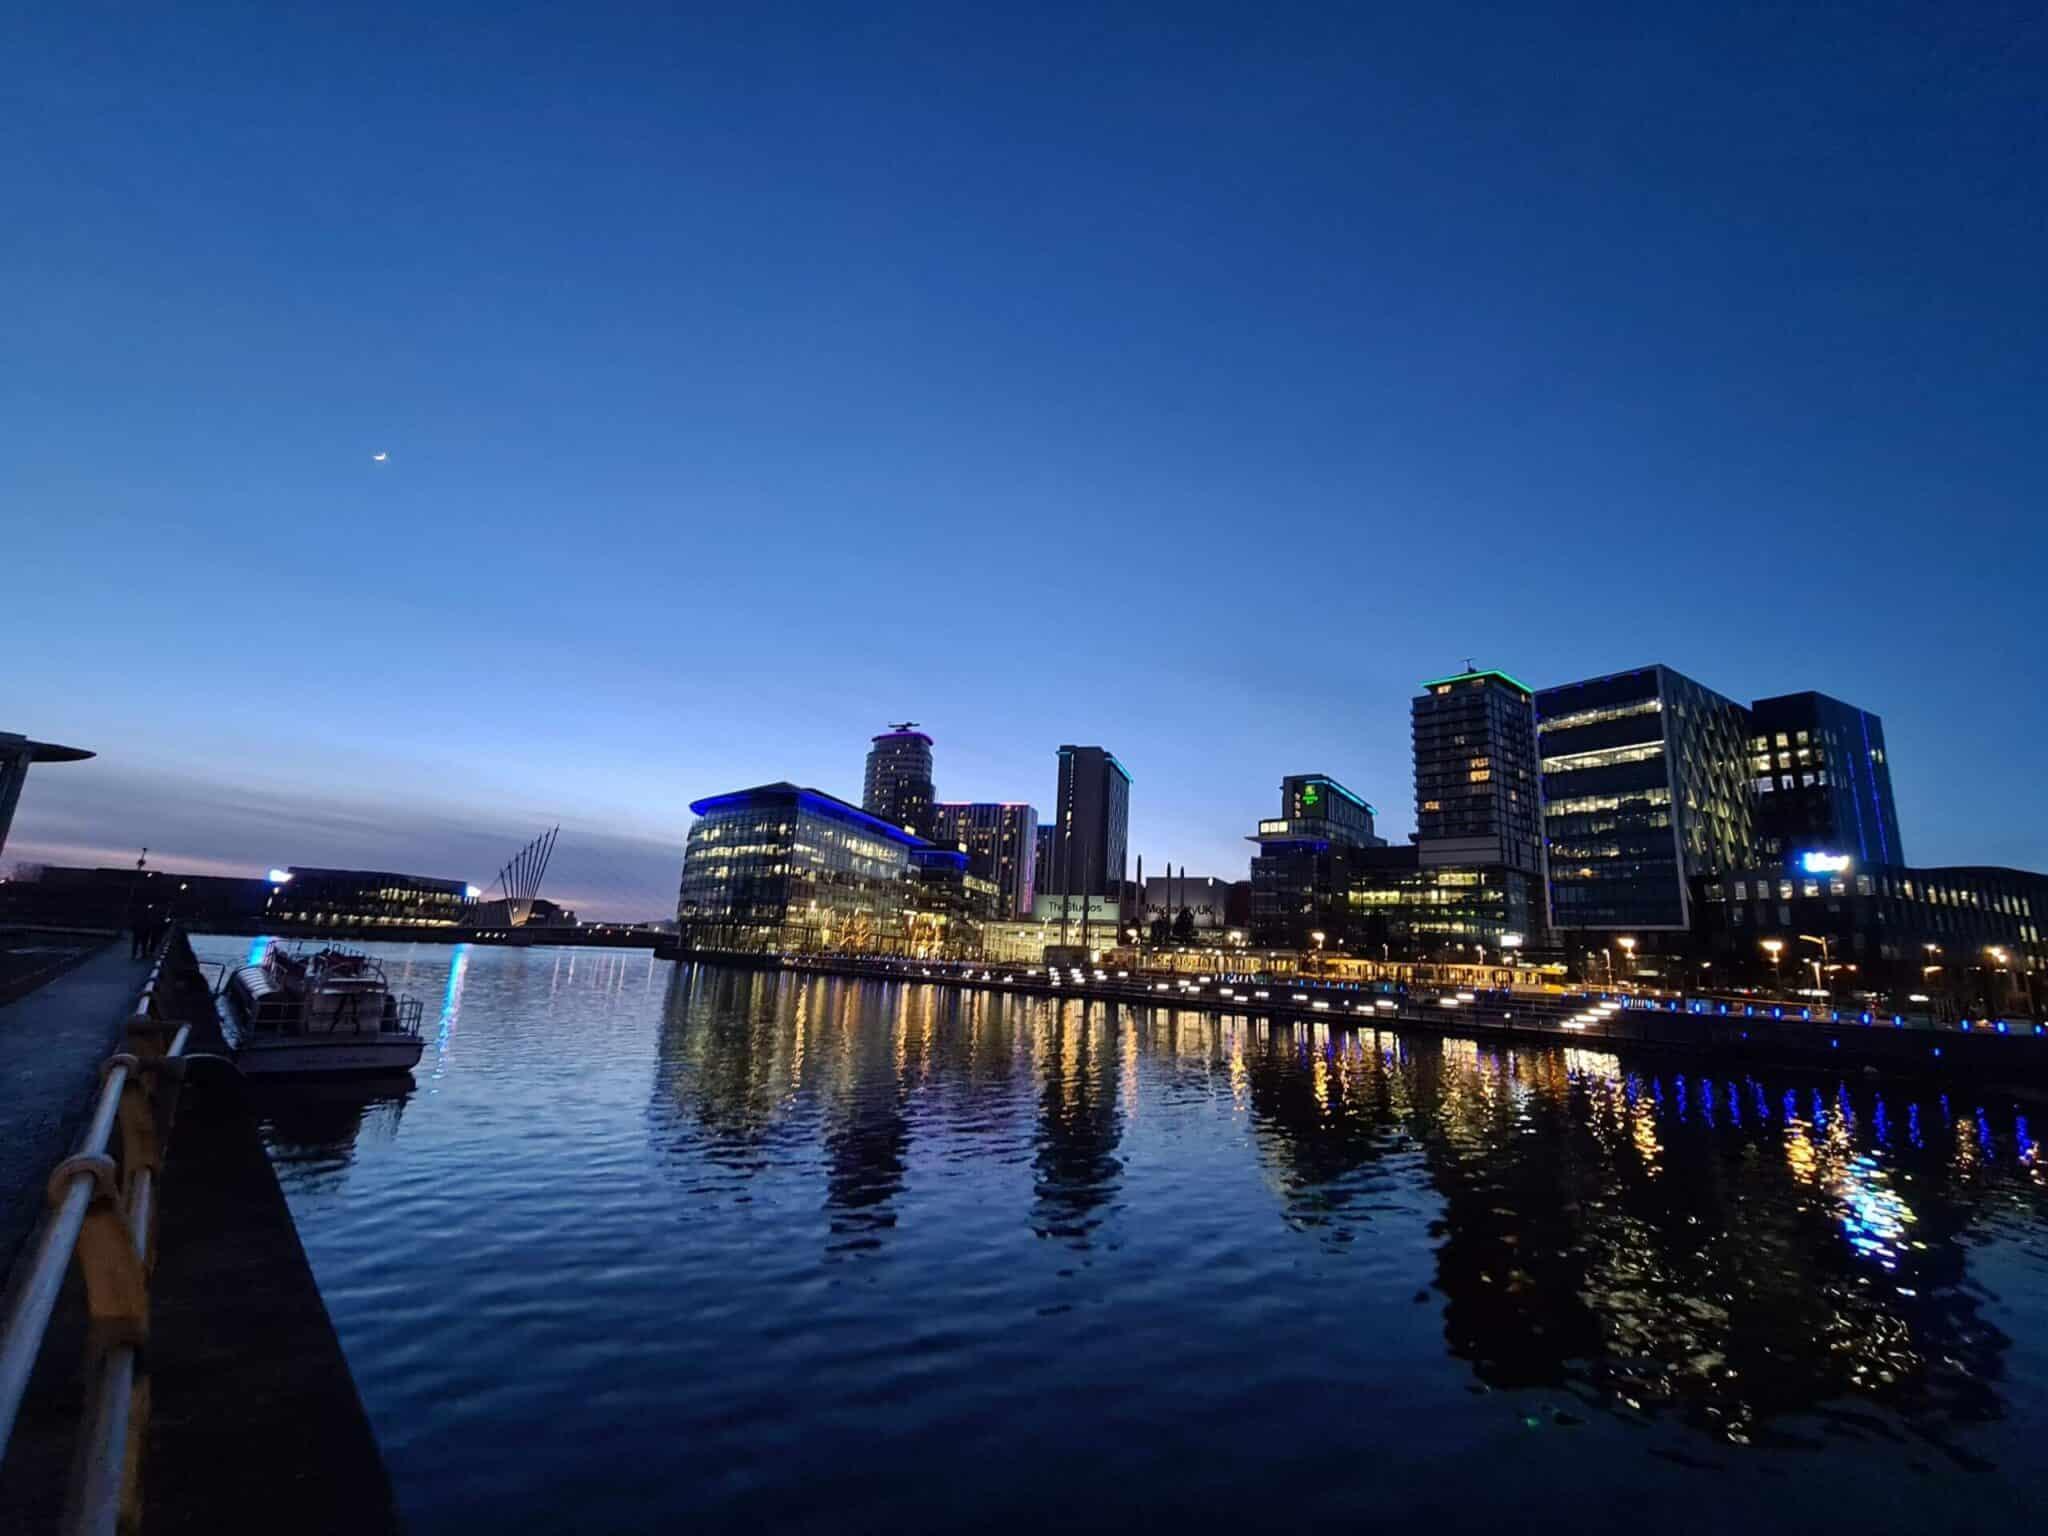 Manchester media city